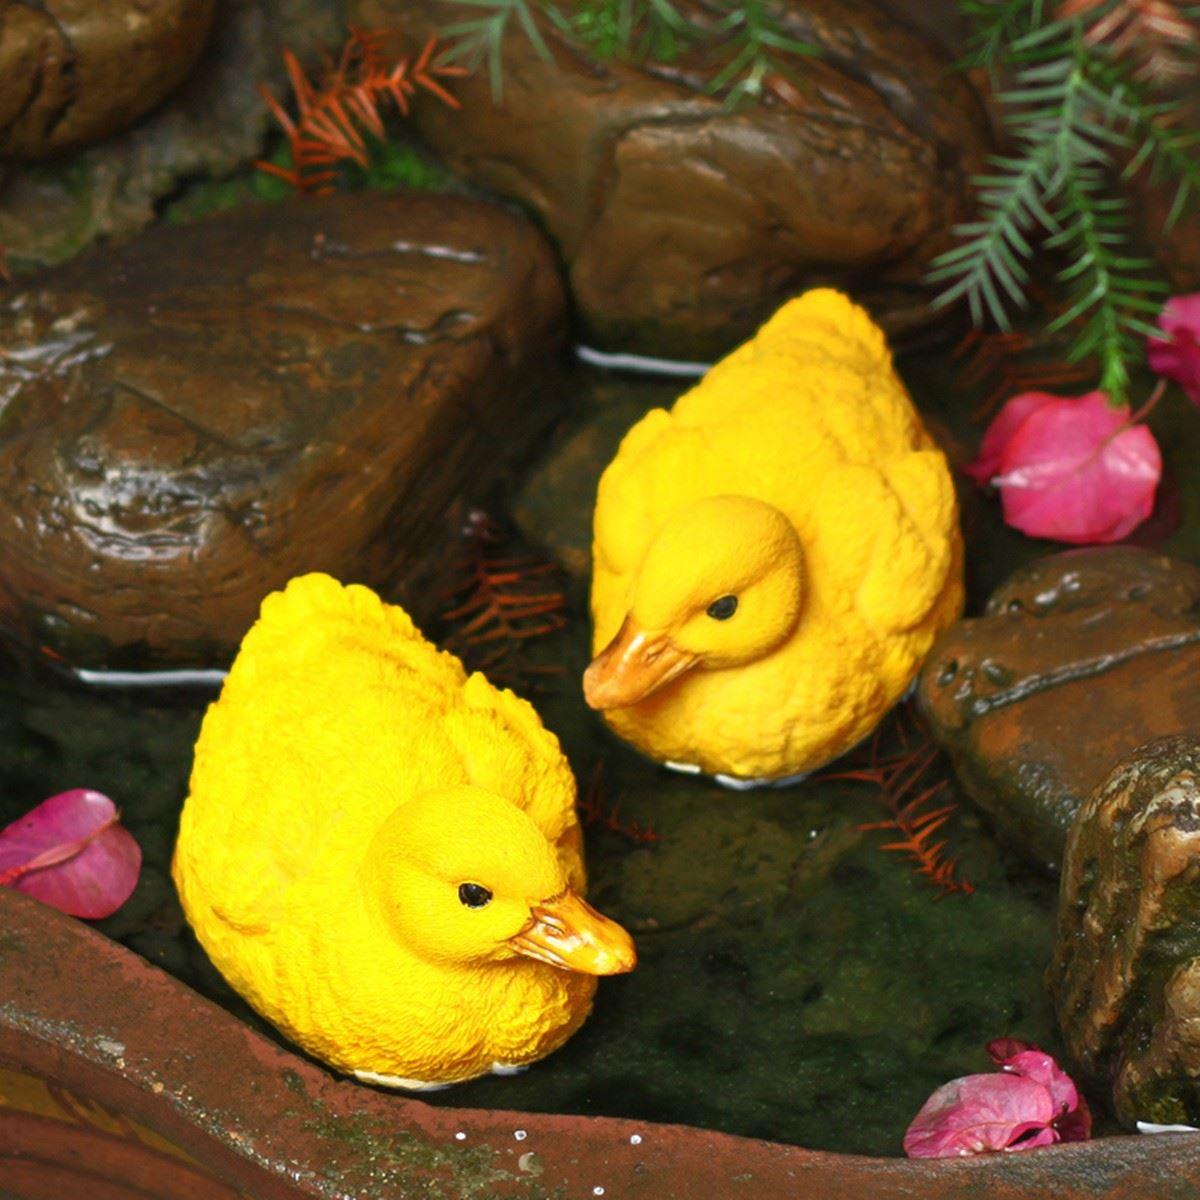 2pcs Small Resin Floating Ducks Outdoor Yard Garden Fish Tank Figurine Artificial Animal Statue Fountain Pond Decoration(China (Mainland))